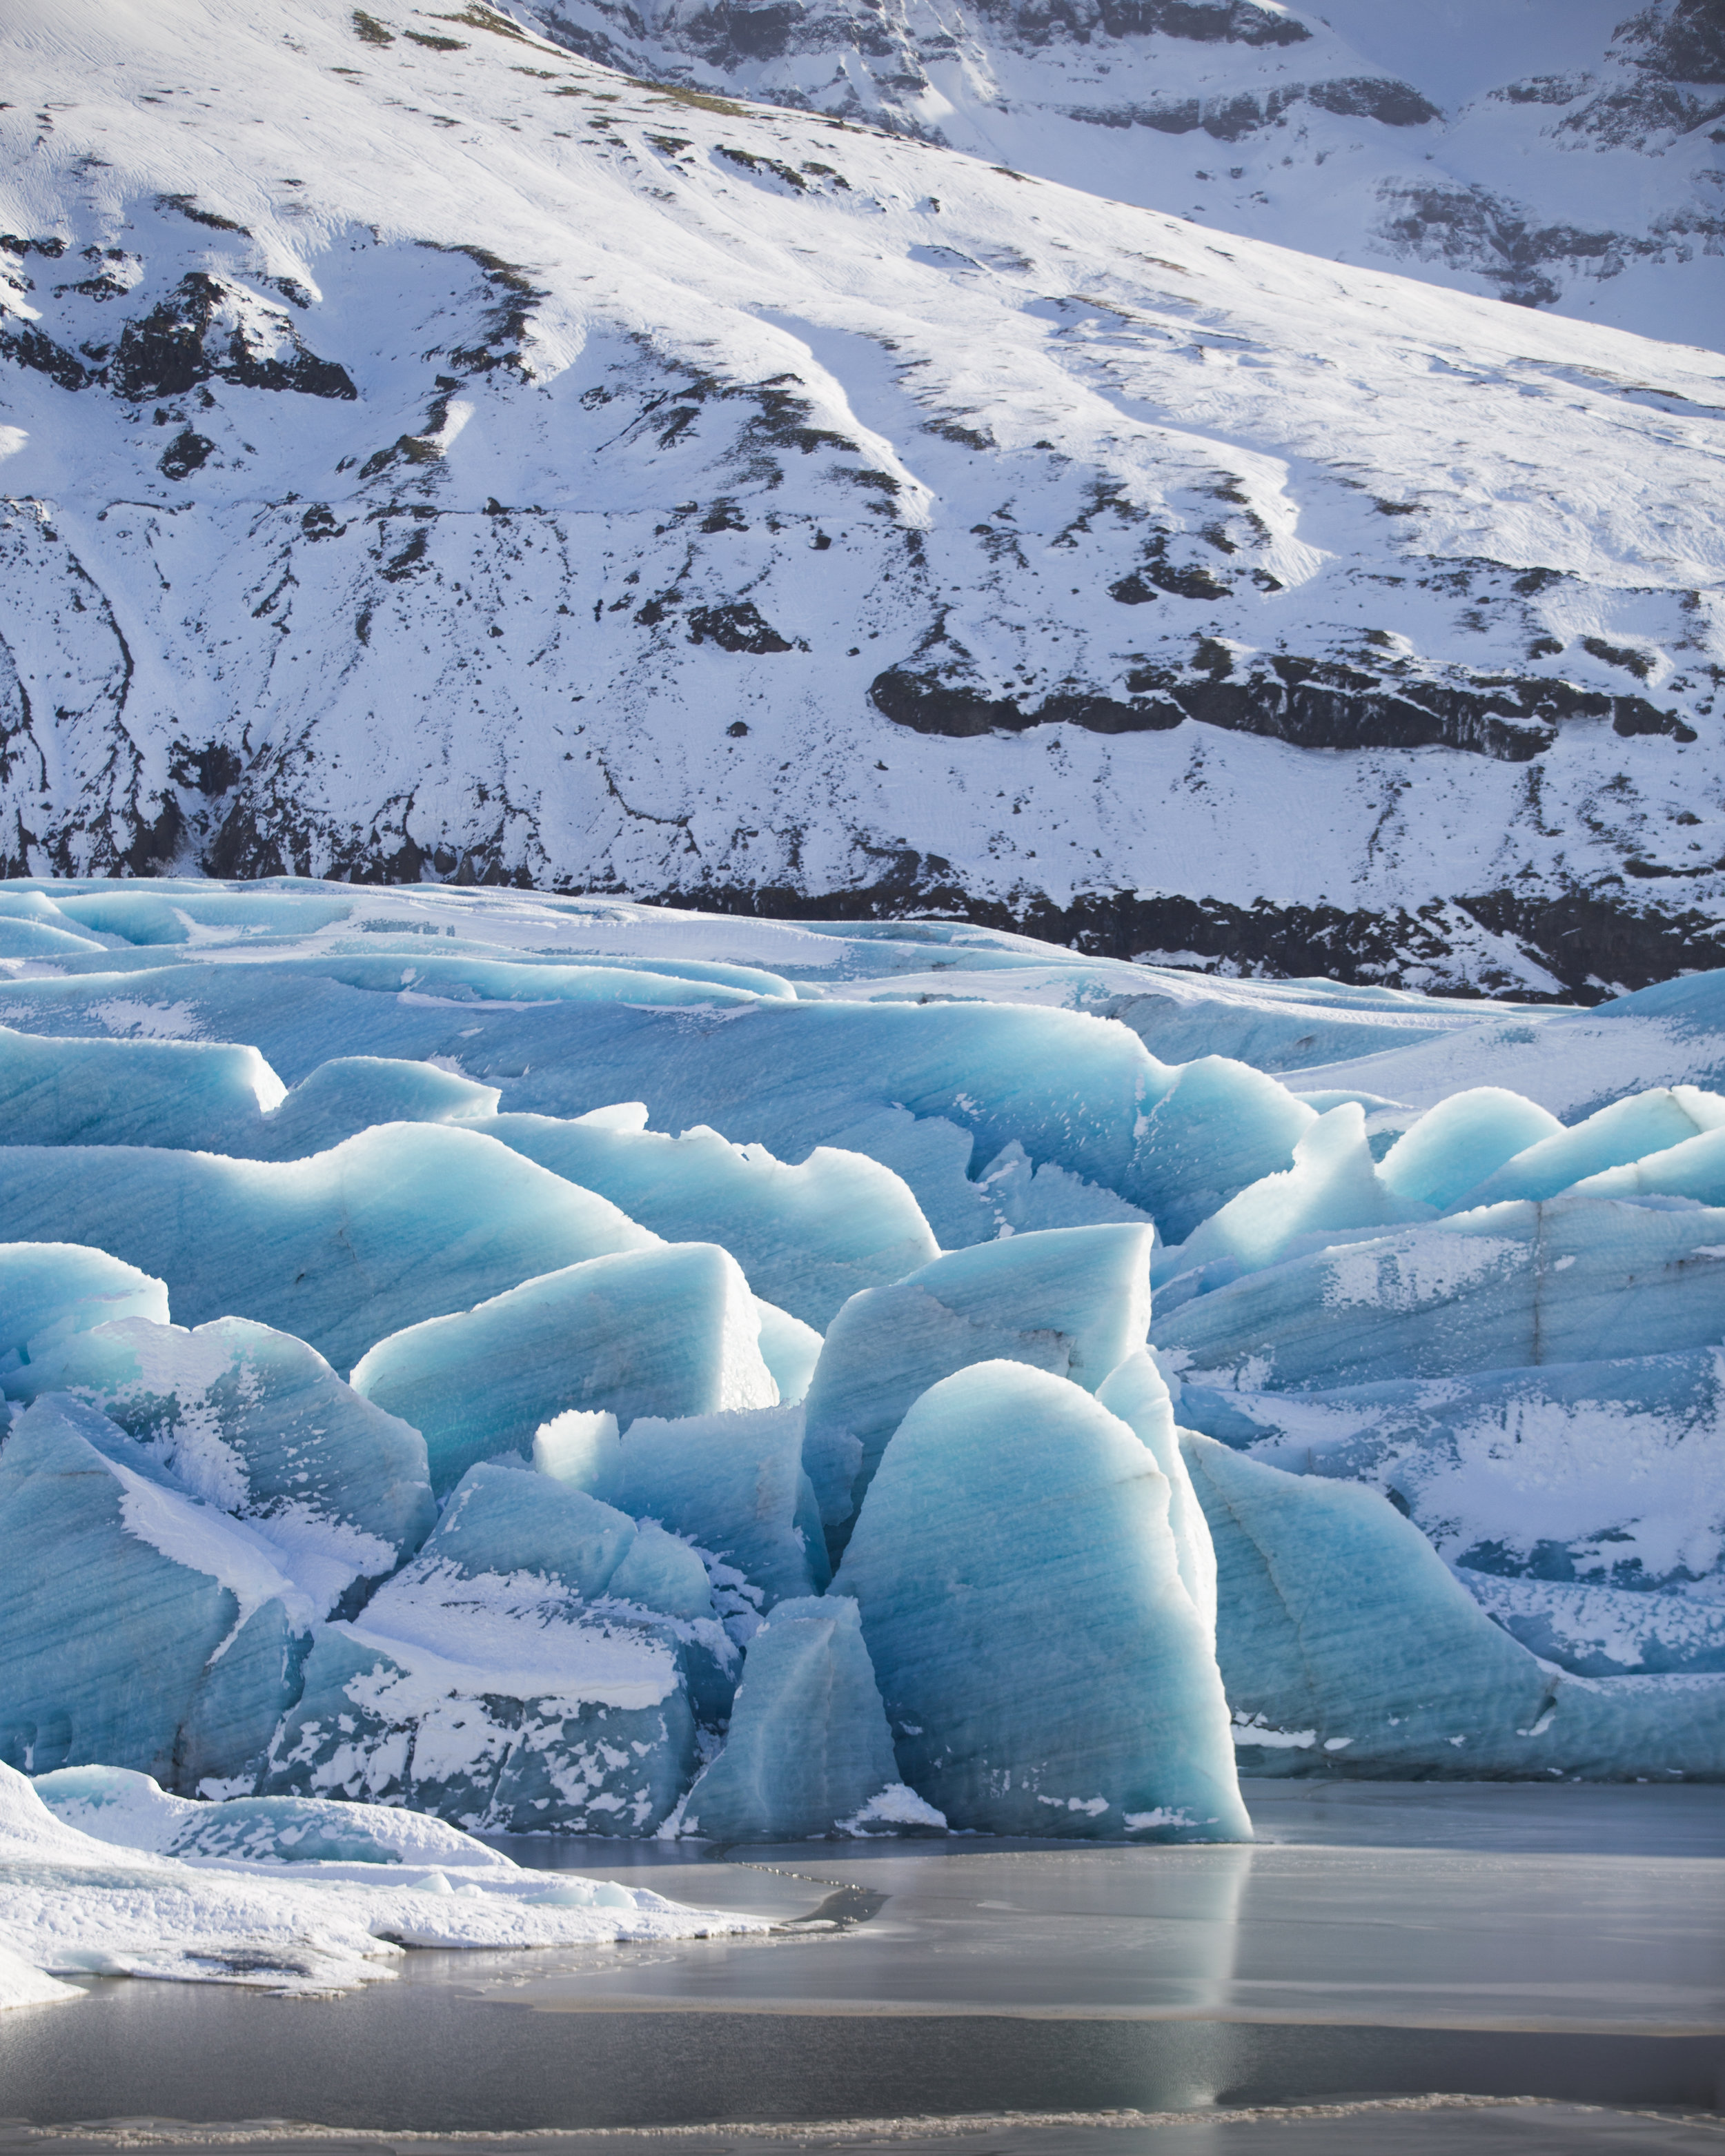 jermiah-schuster-iceland-433.jpg